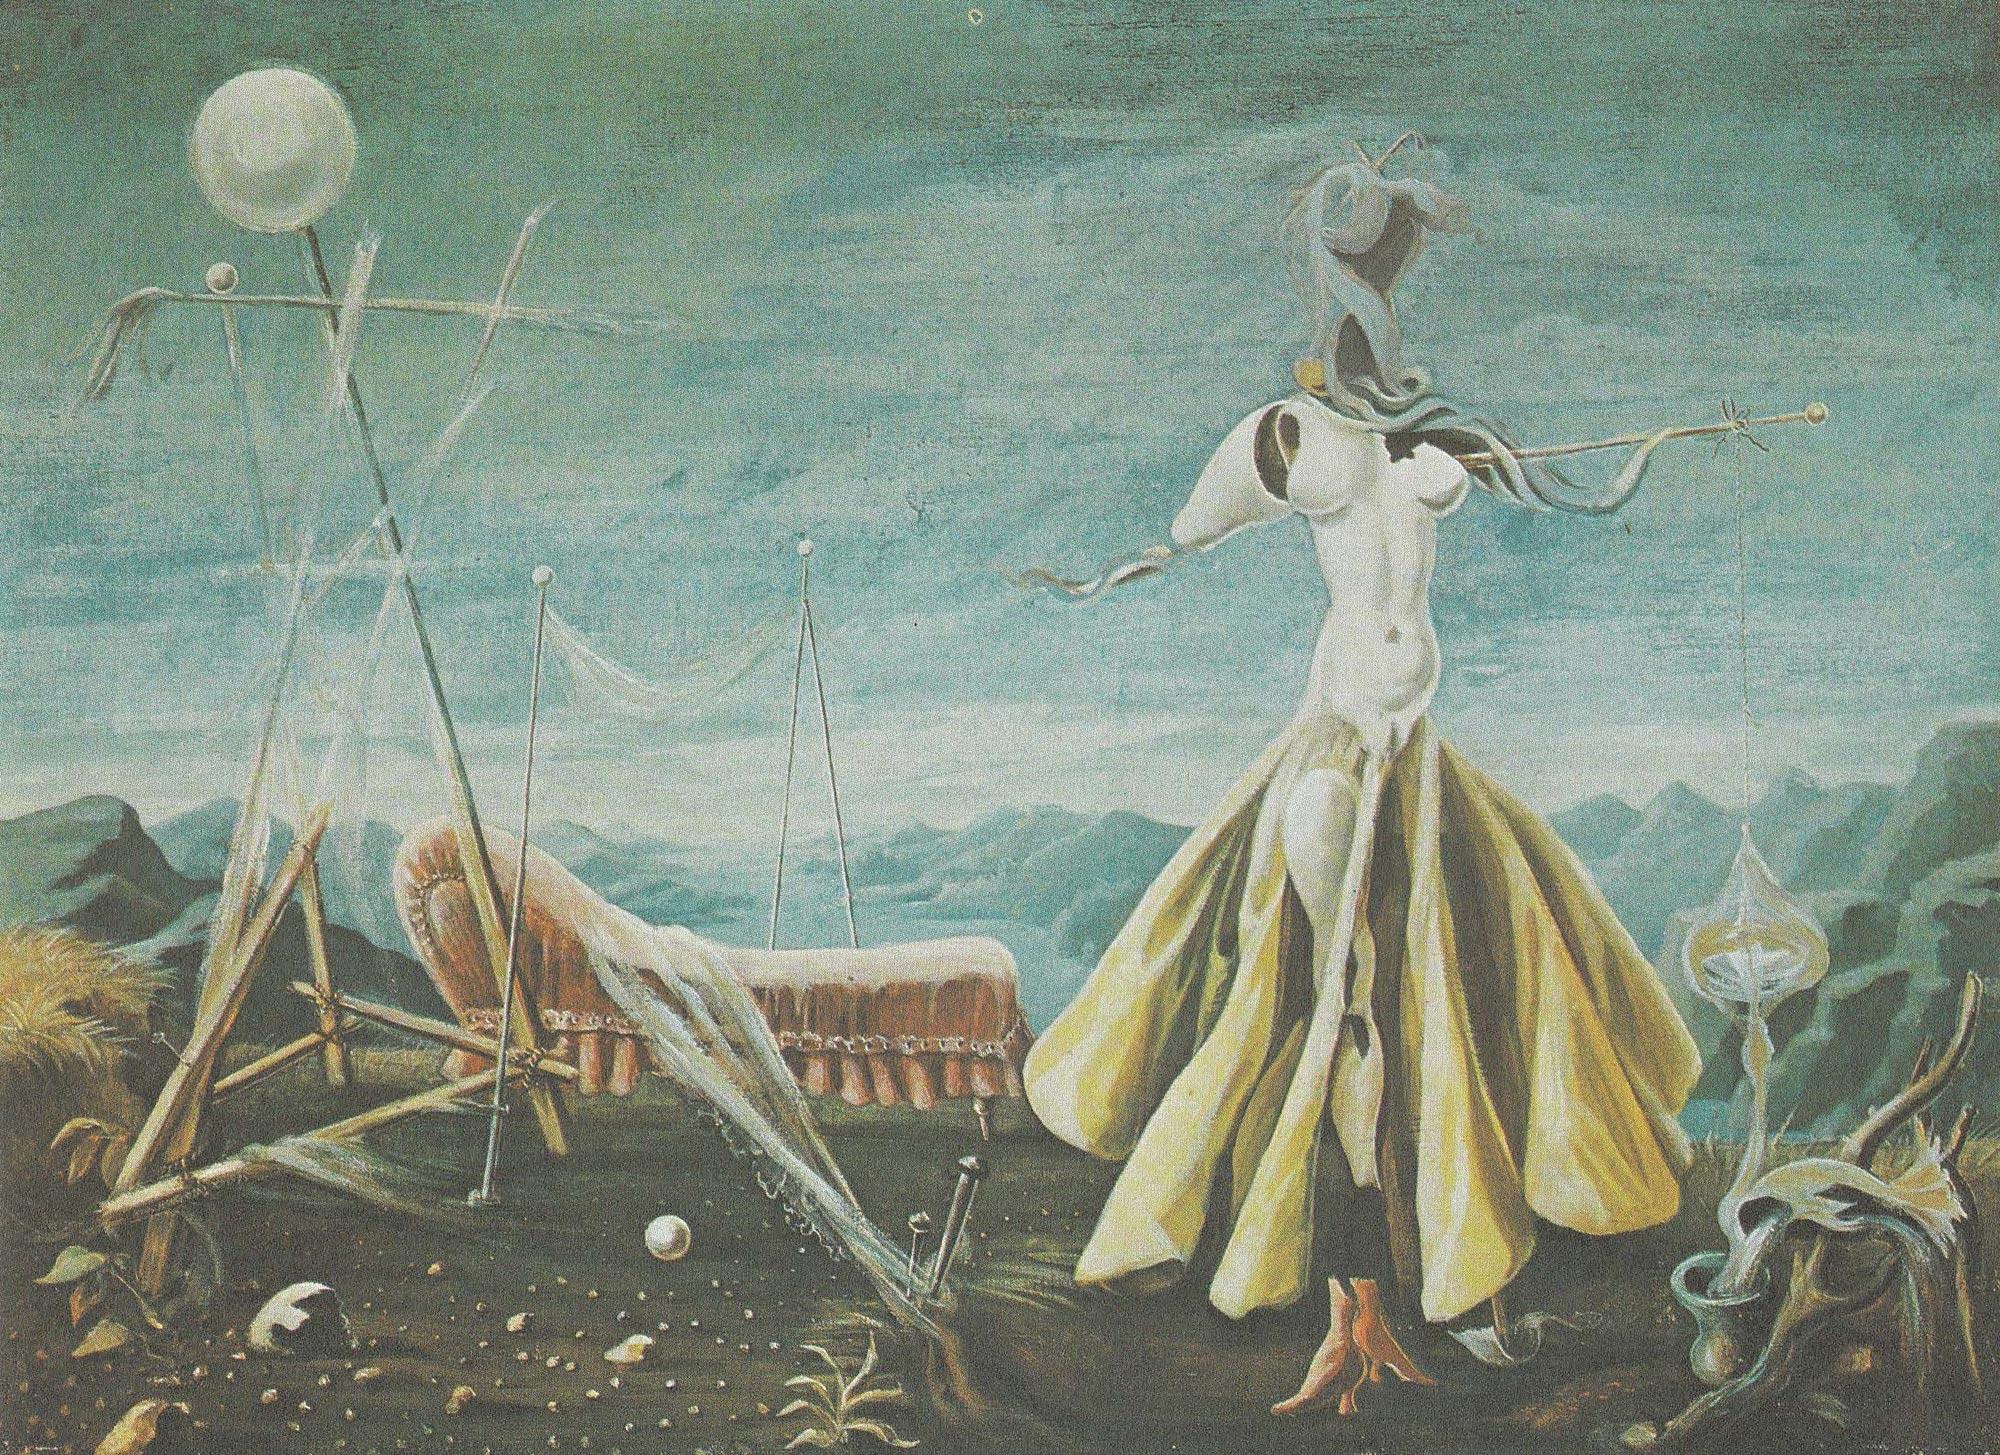 3 Hein Heckroth, Free Love, 1939, Öl auf Leinwand, 76,3 × 101,5 cm (Gabler 1977, Kat.-Nr. 18)